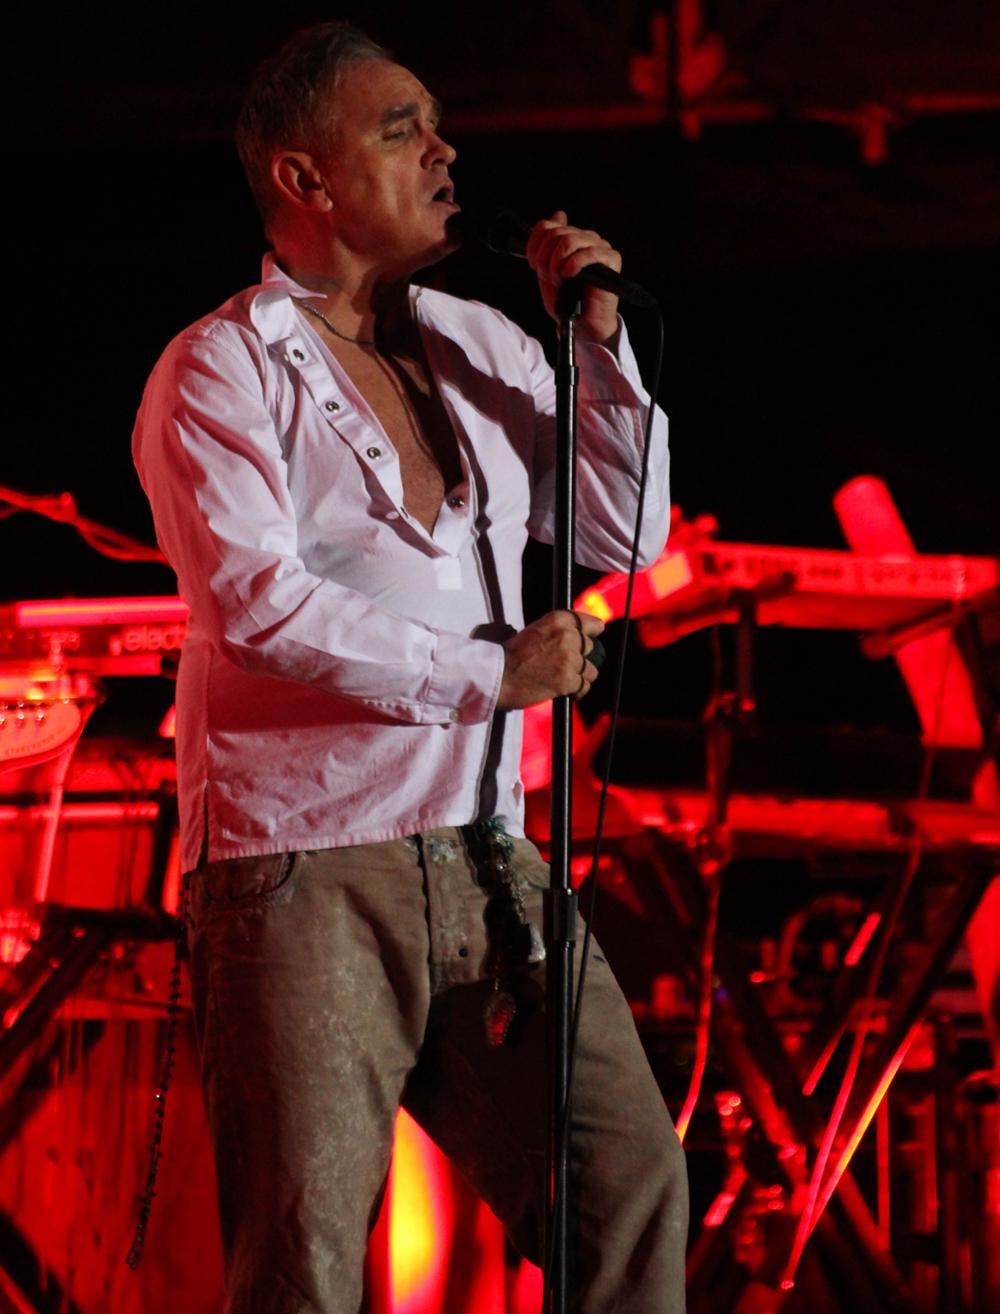 MORRISEY_Festival_Roxy_Edgar_Sagra_Bizarro_FM (11)